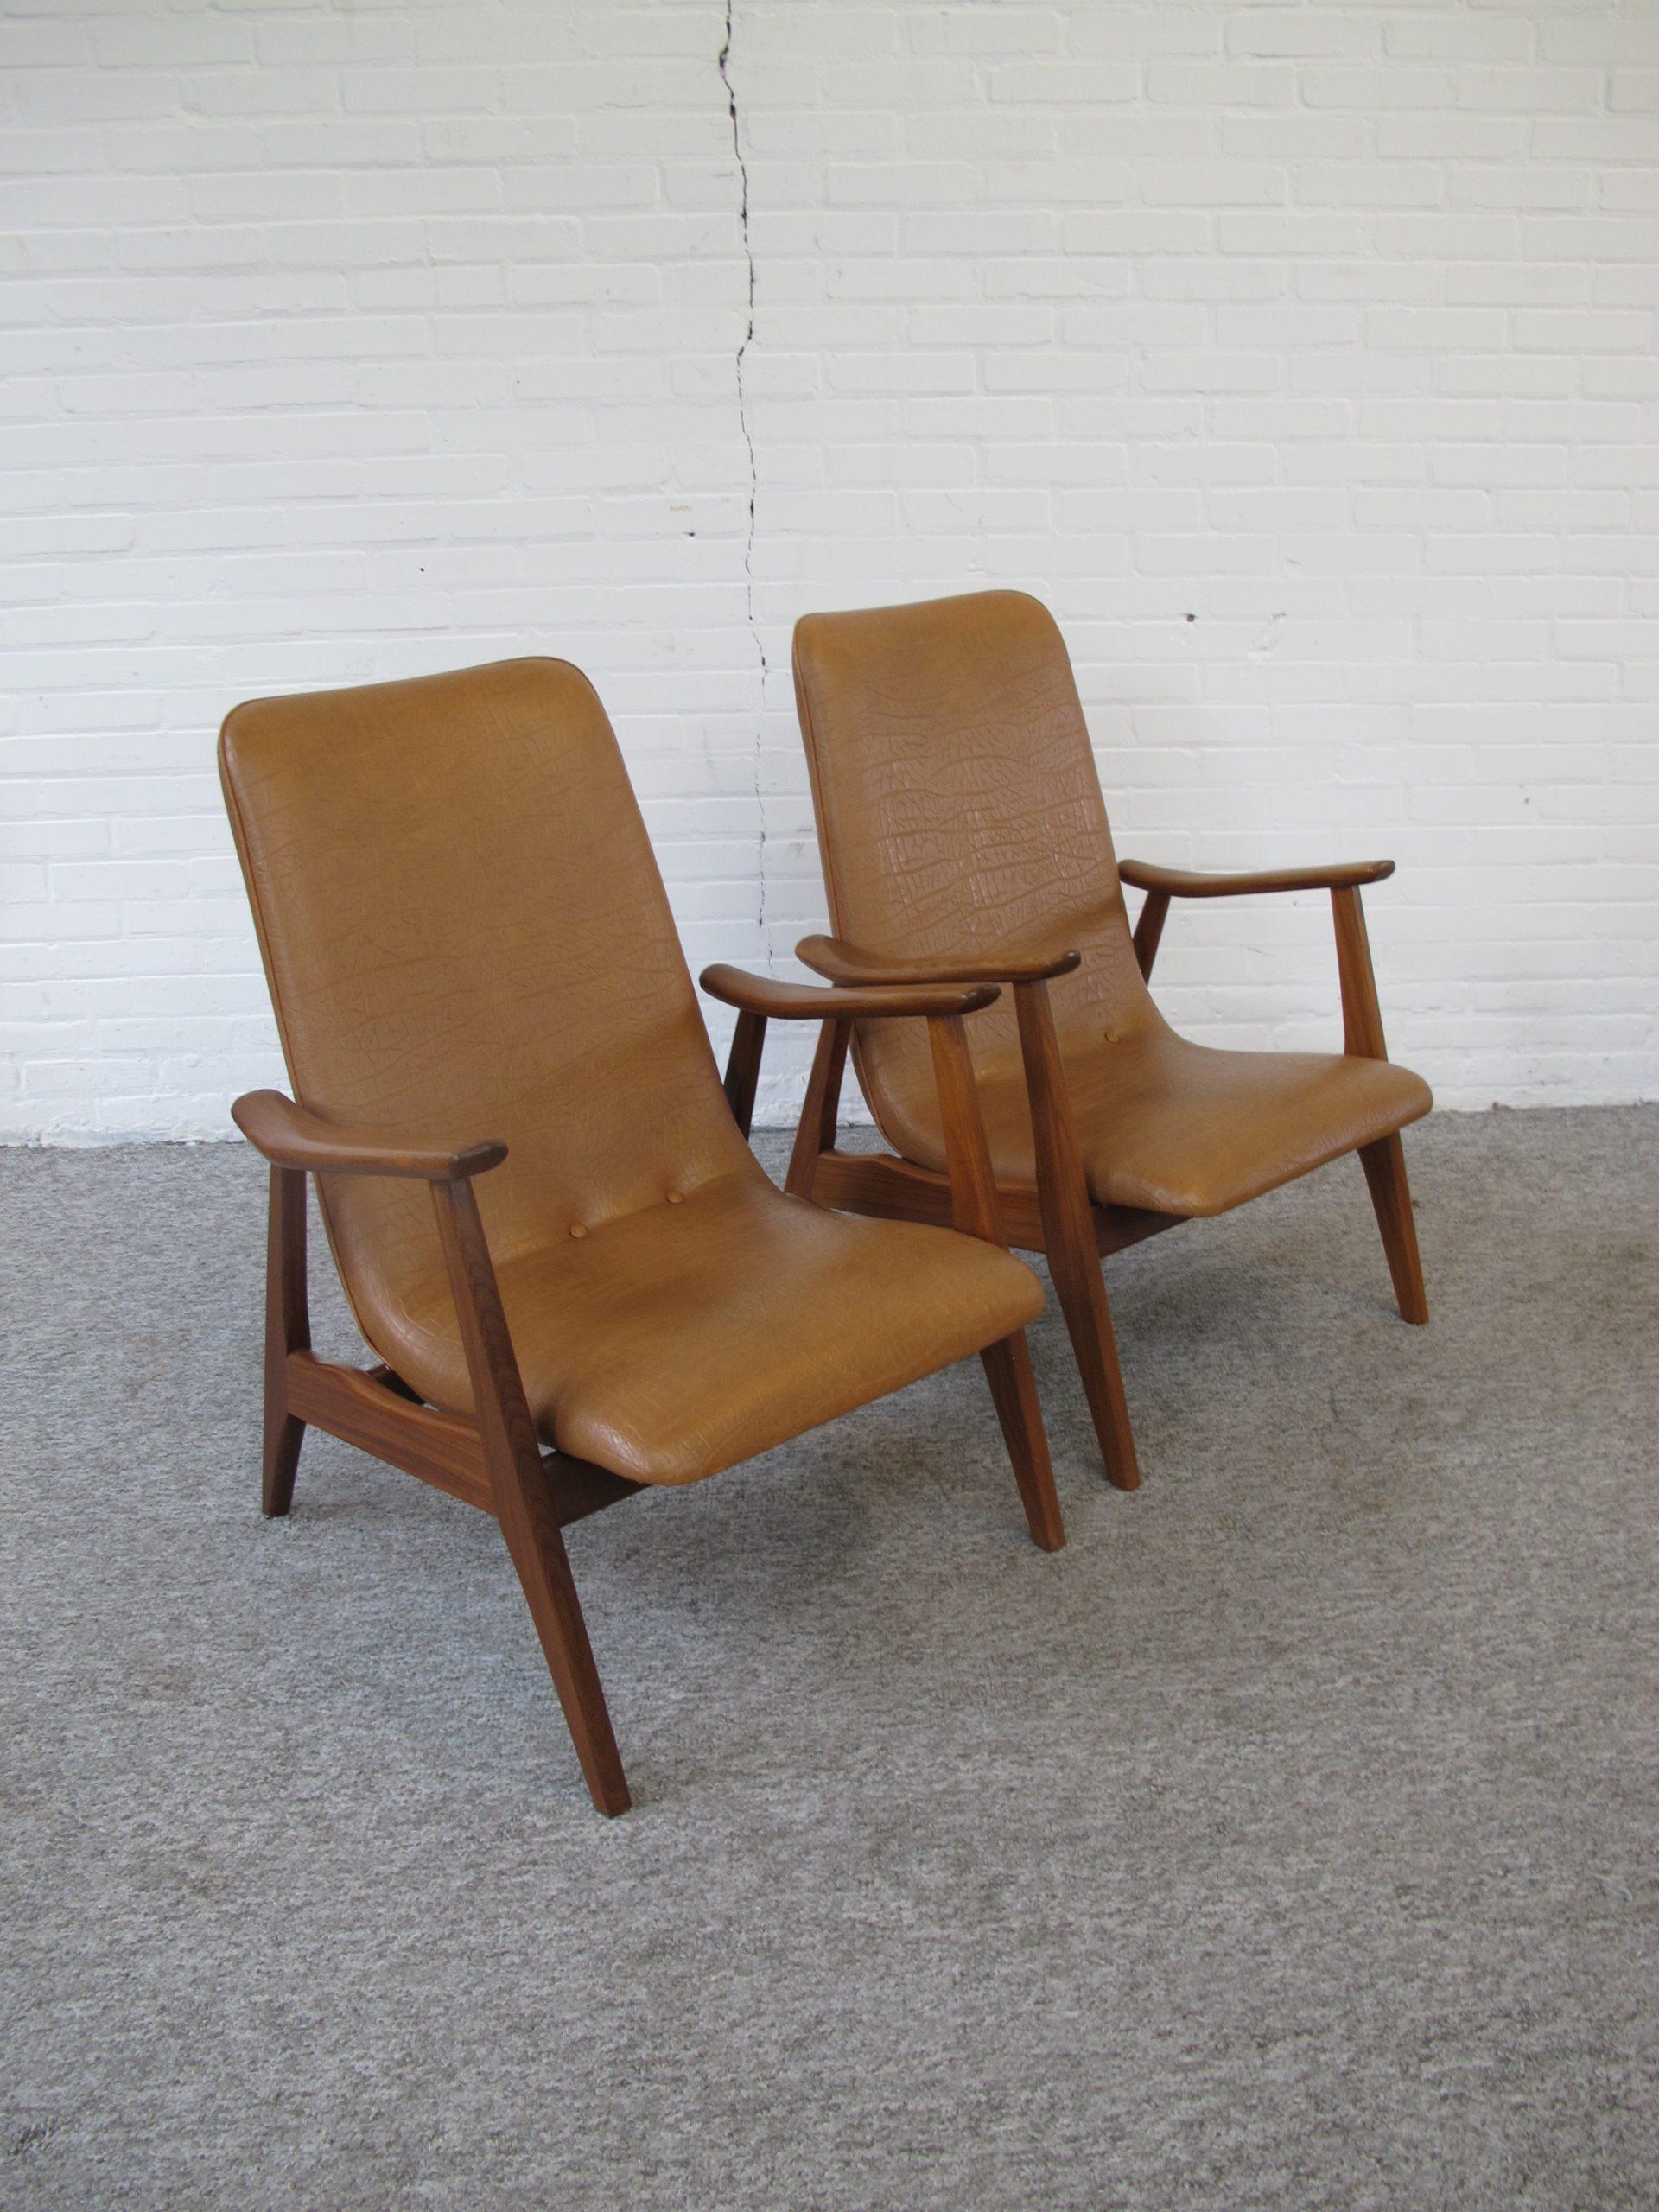 Armchair fauteuil Louis van Teeffelen Wébé lounge chairs vintage midcentury